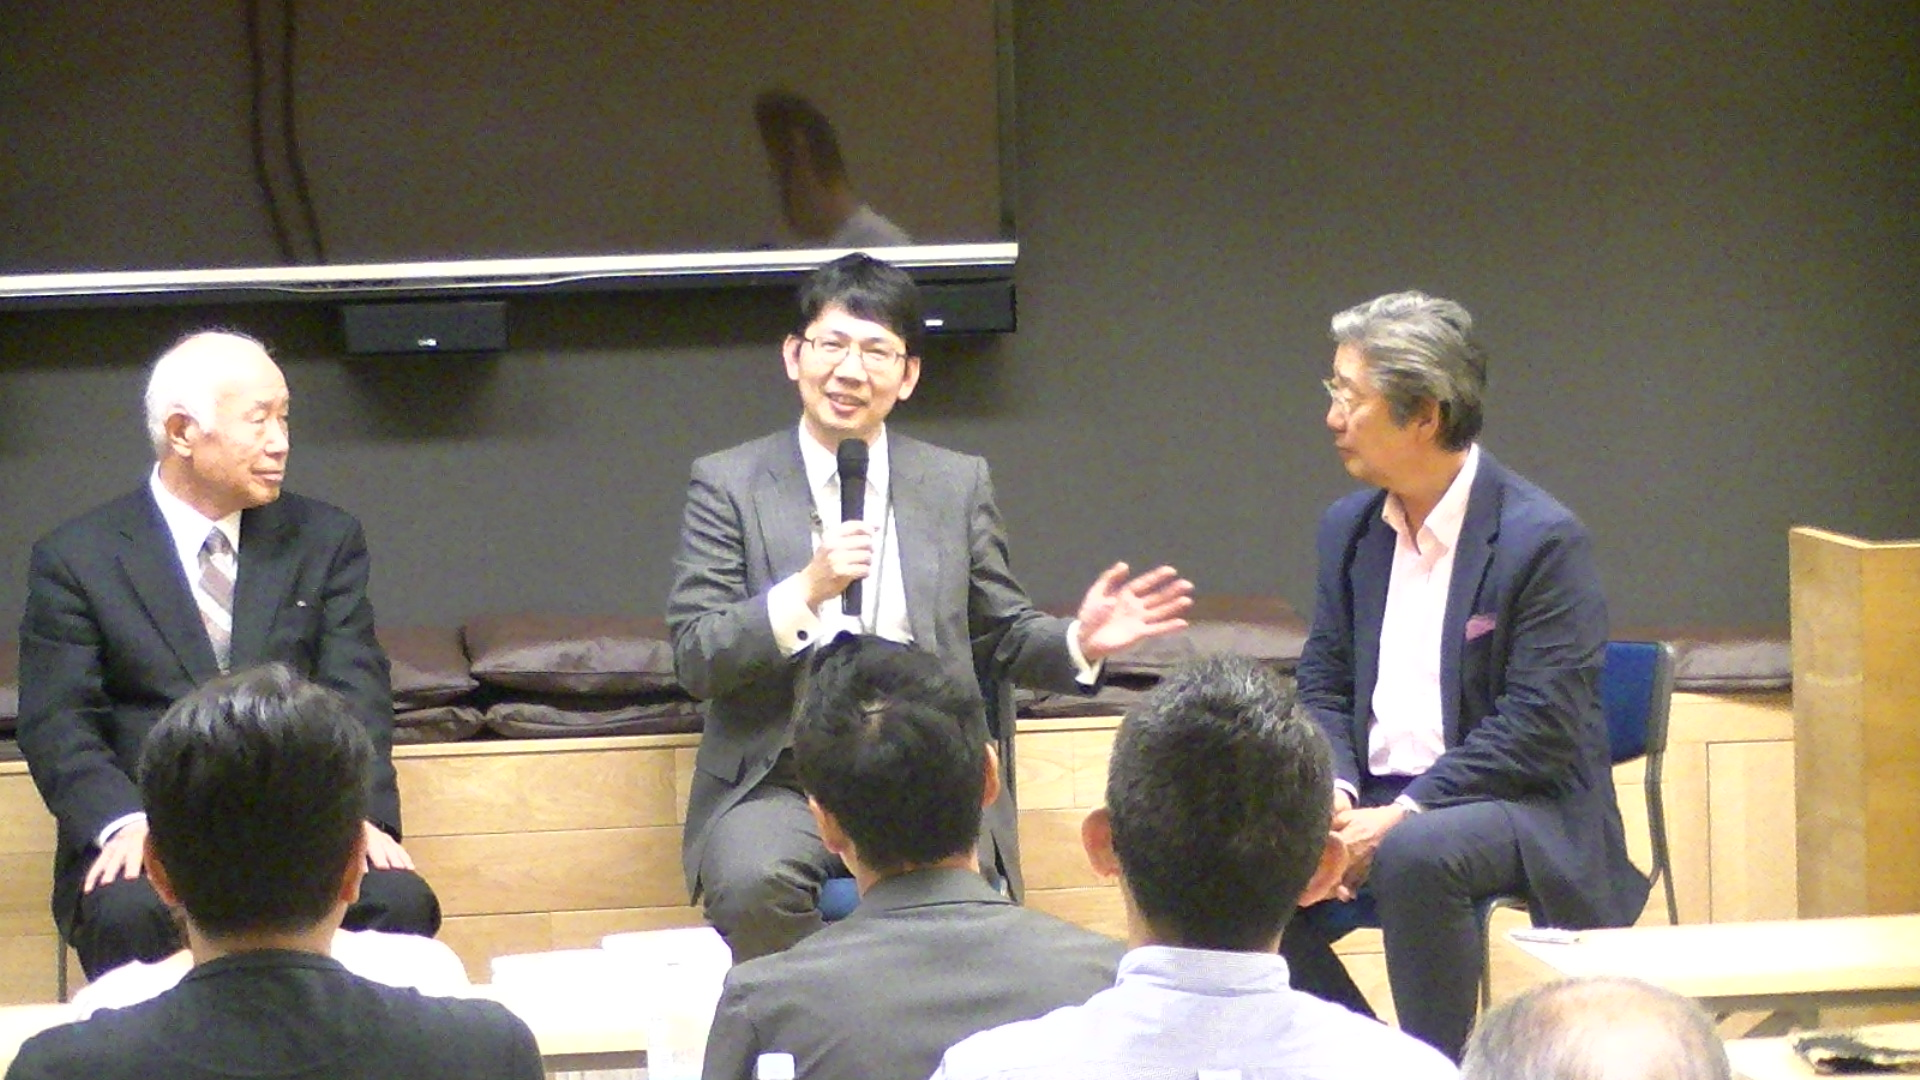 PIC 0040 - 4月1日東京思風塾の開催になります。